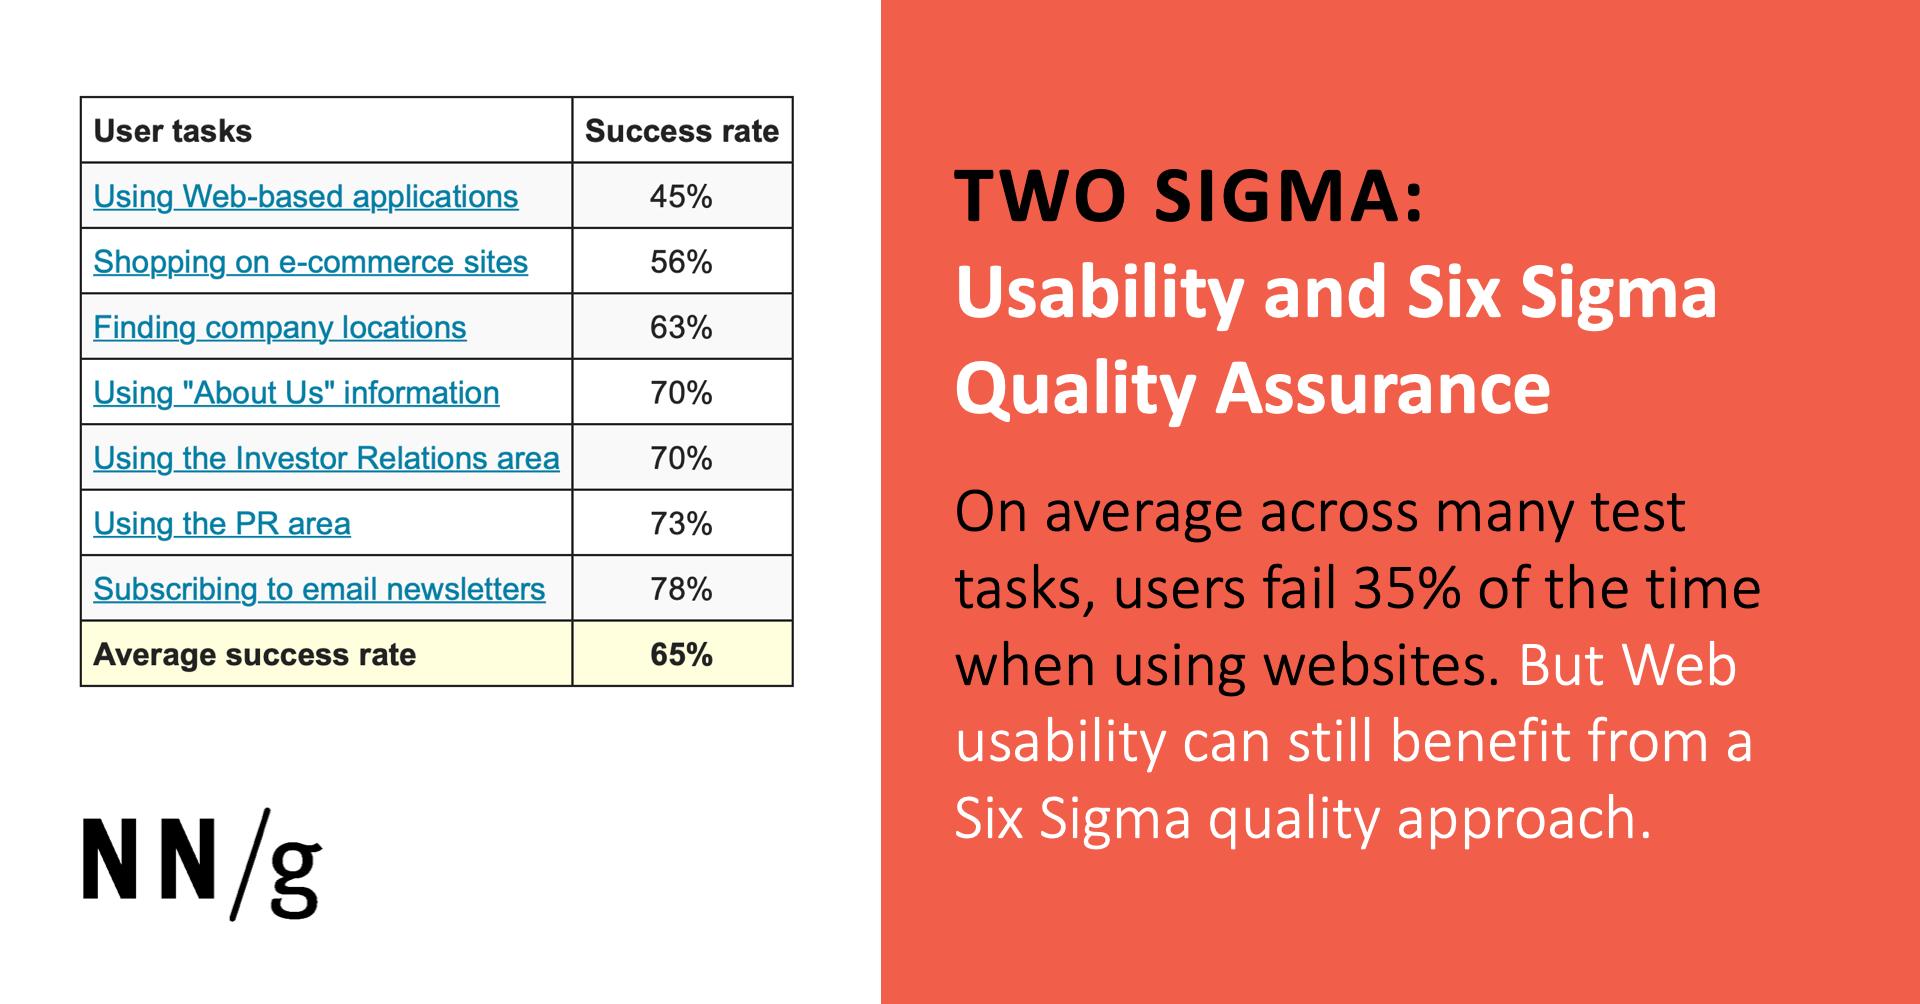 Two Sigma Usability And Six Sigma Quality Assurance